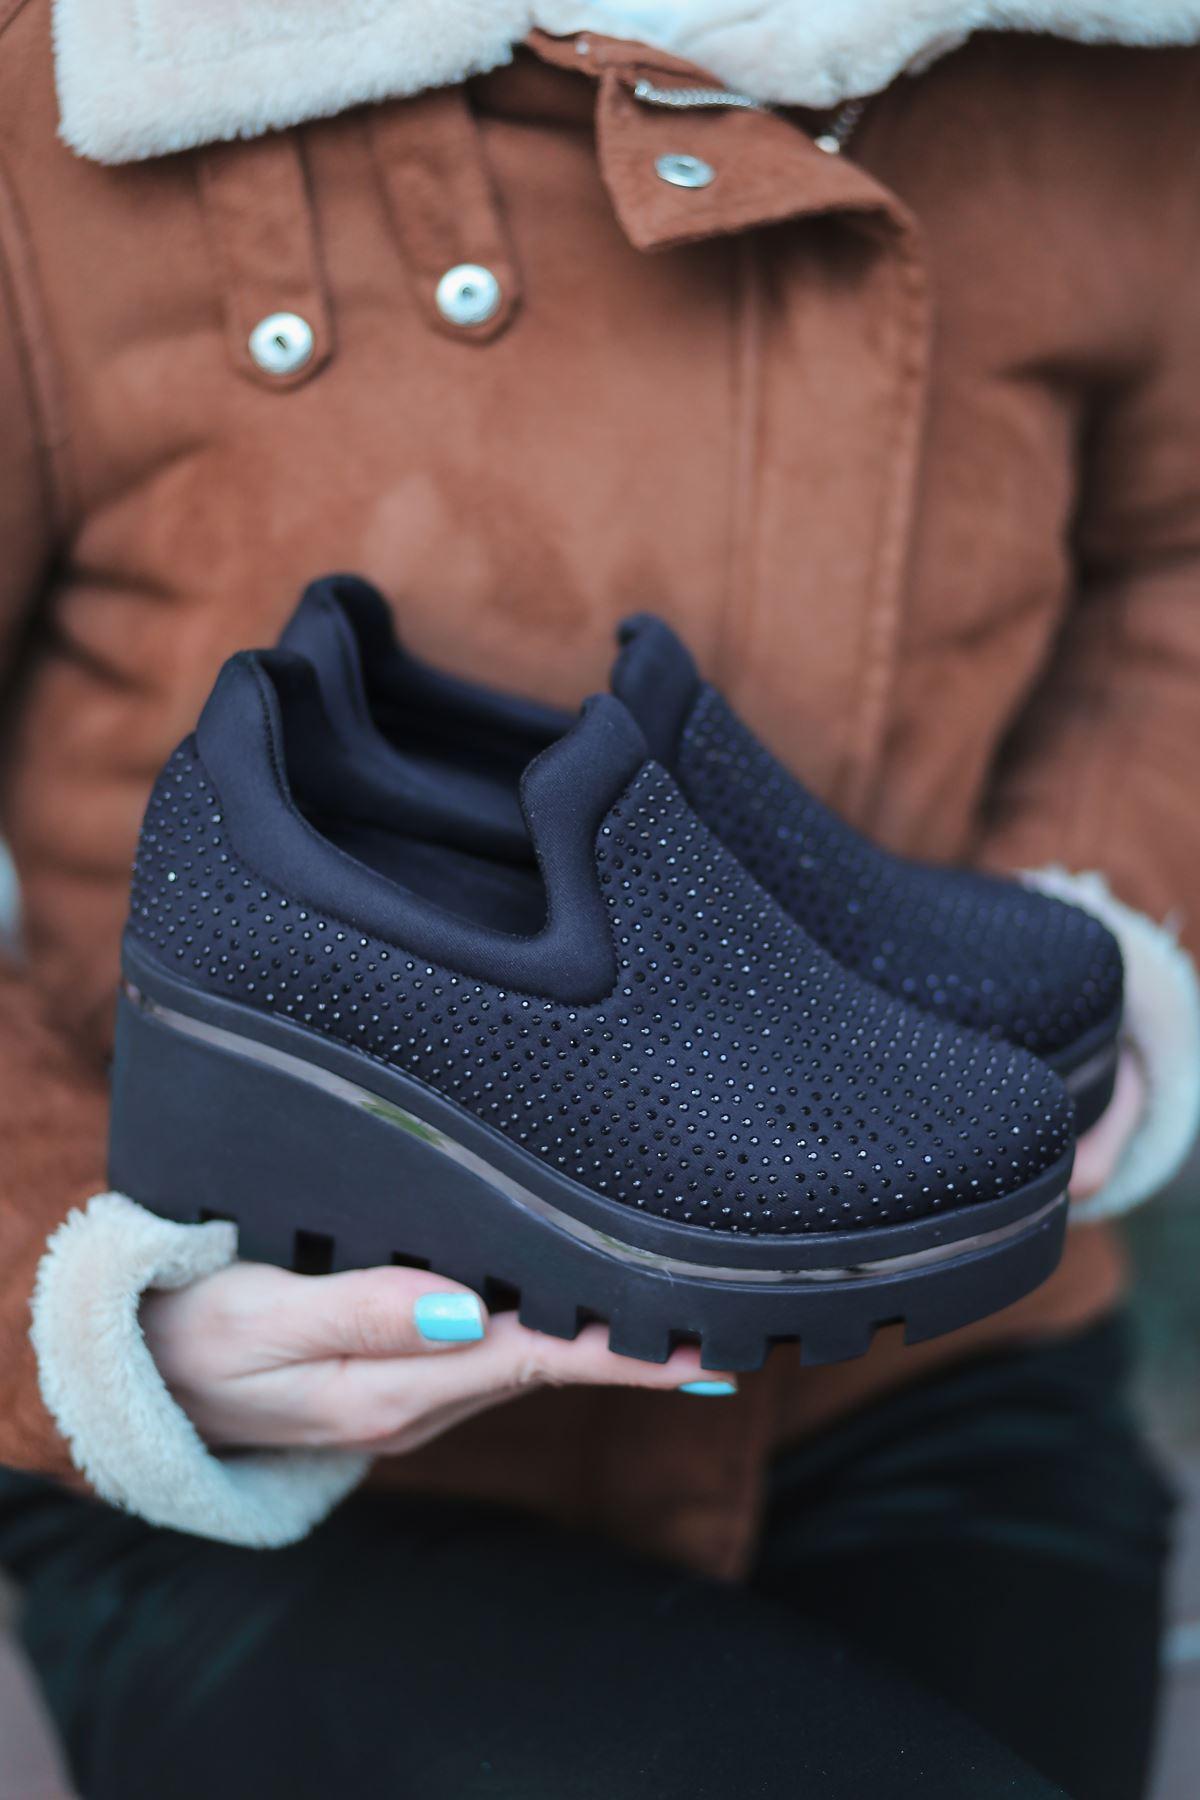 Bratz Taş Detay Dolgu Topuk Ayakkabı Siyah